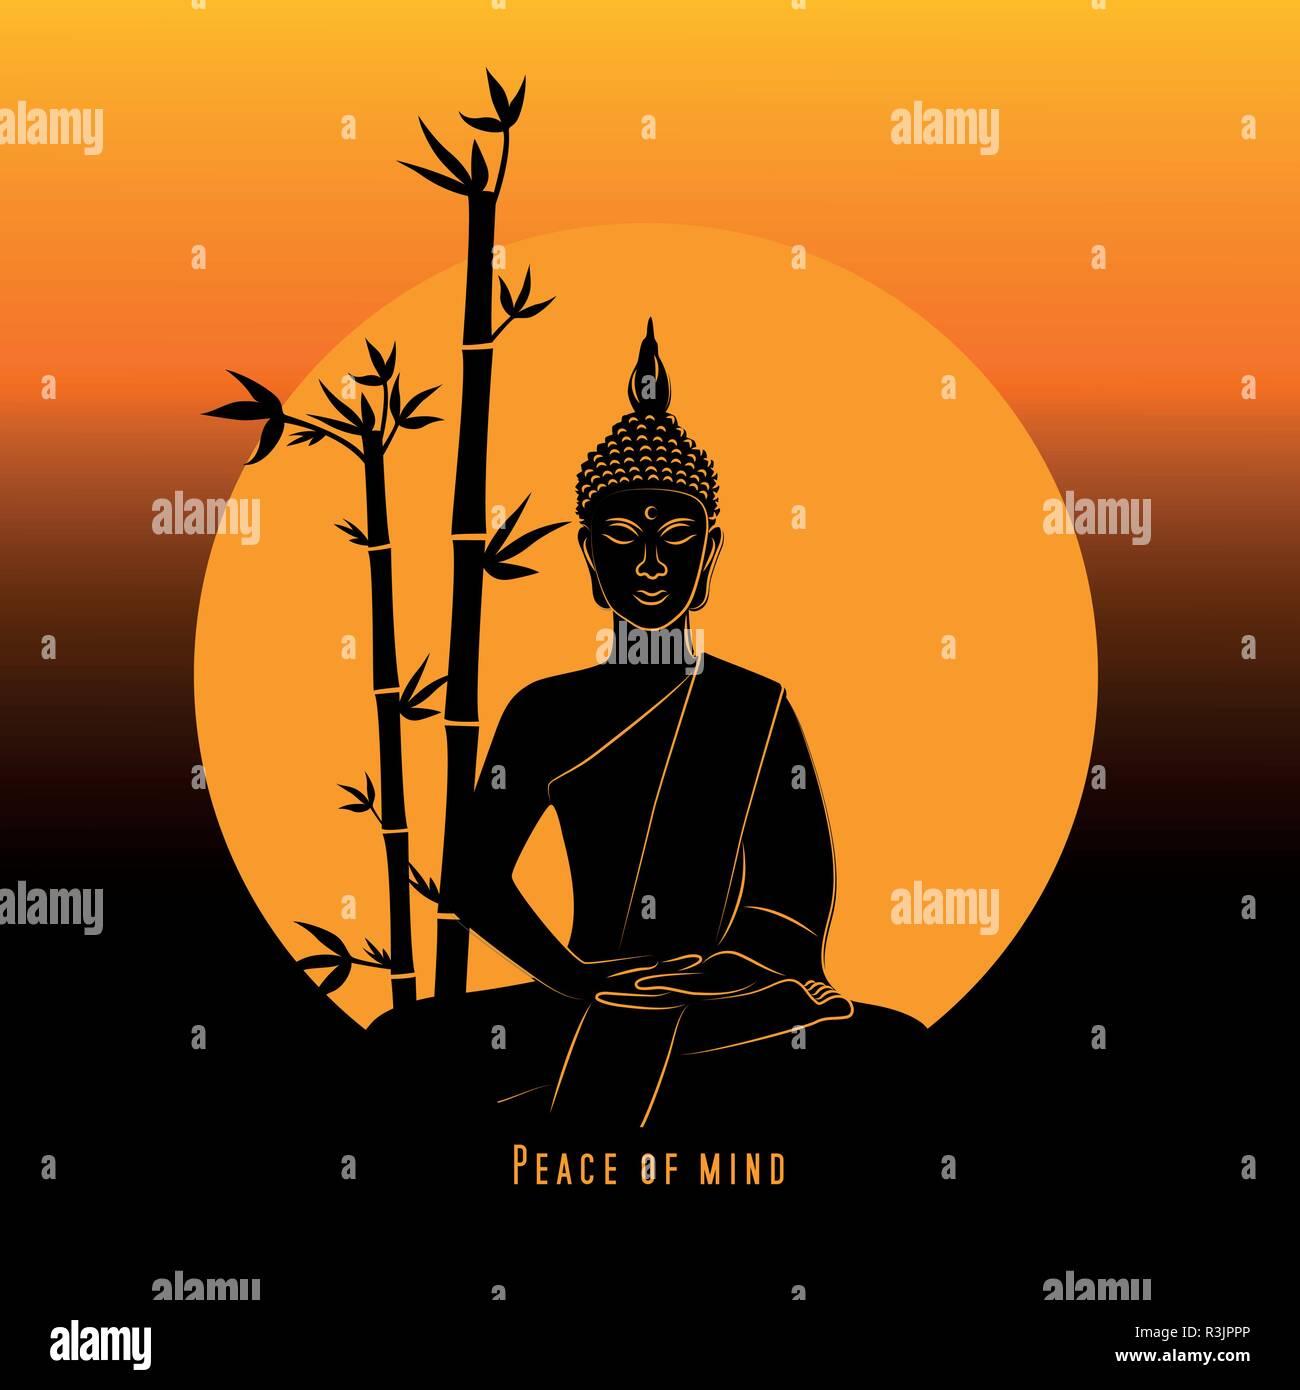 Peace Of Mind Buddha Meditation At Sunset Vector Illustration Eps10 Stock Vector Image Art Alamy